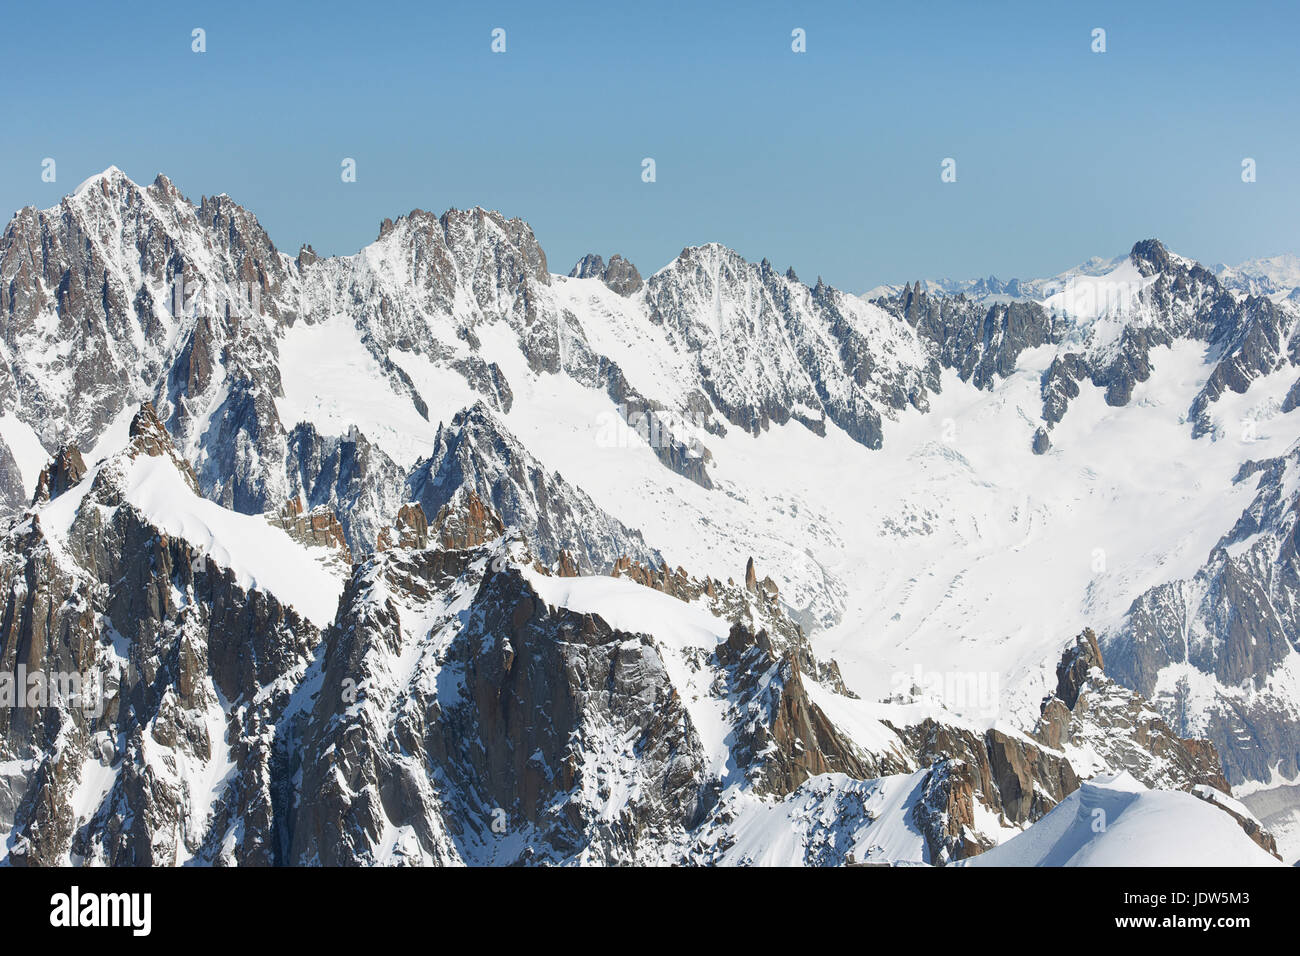 Snowy mountain scene, Chamonix, France - Stock Image